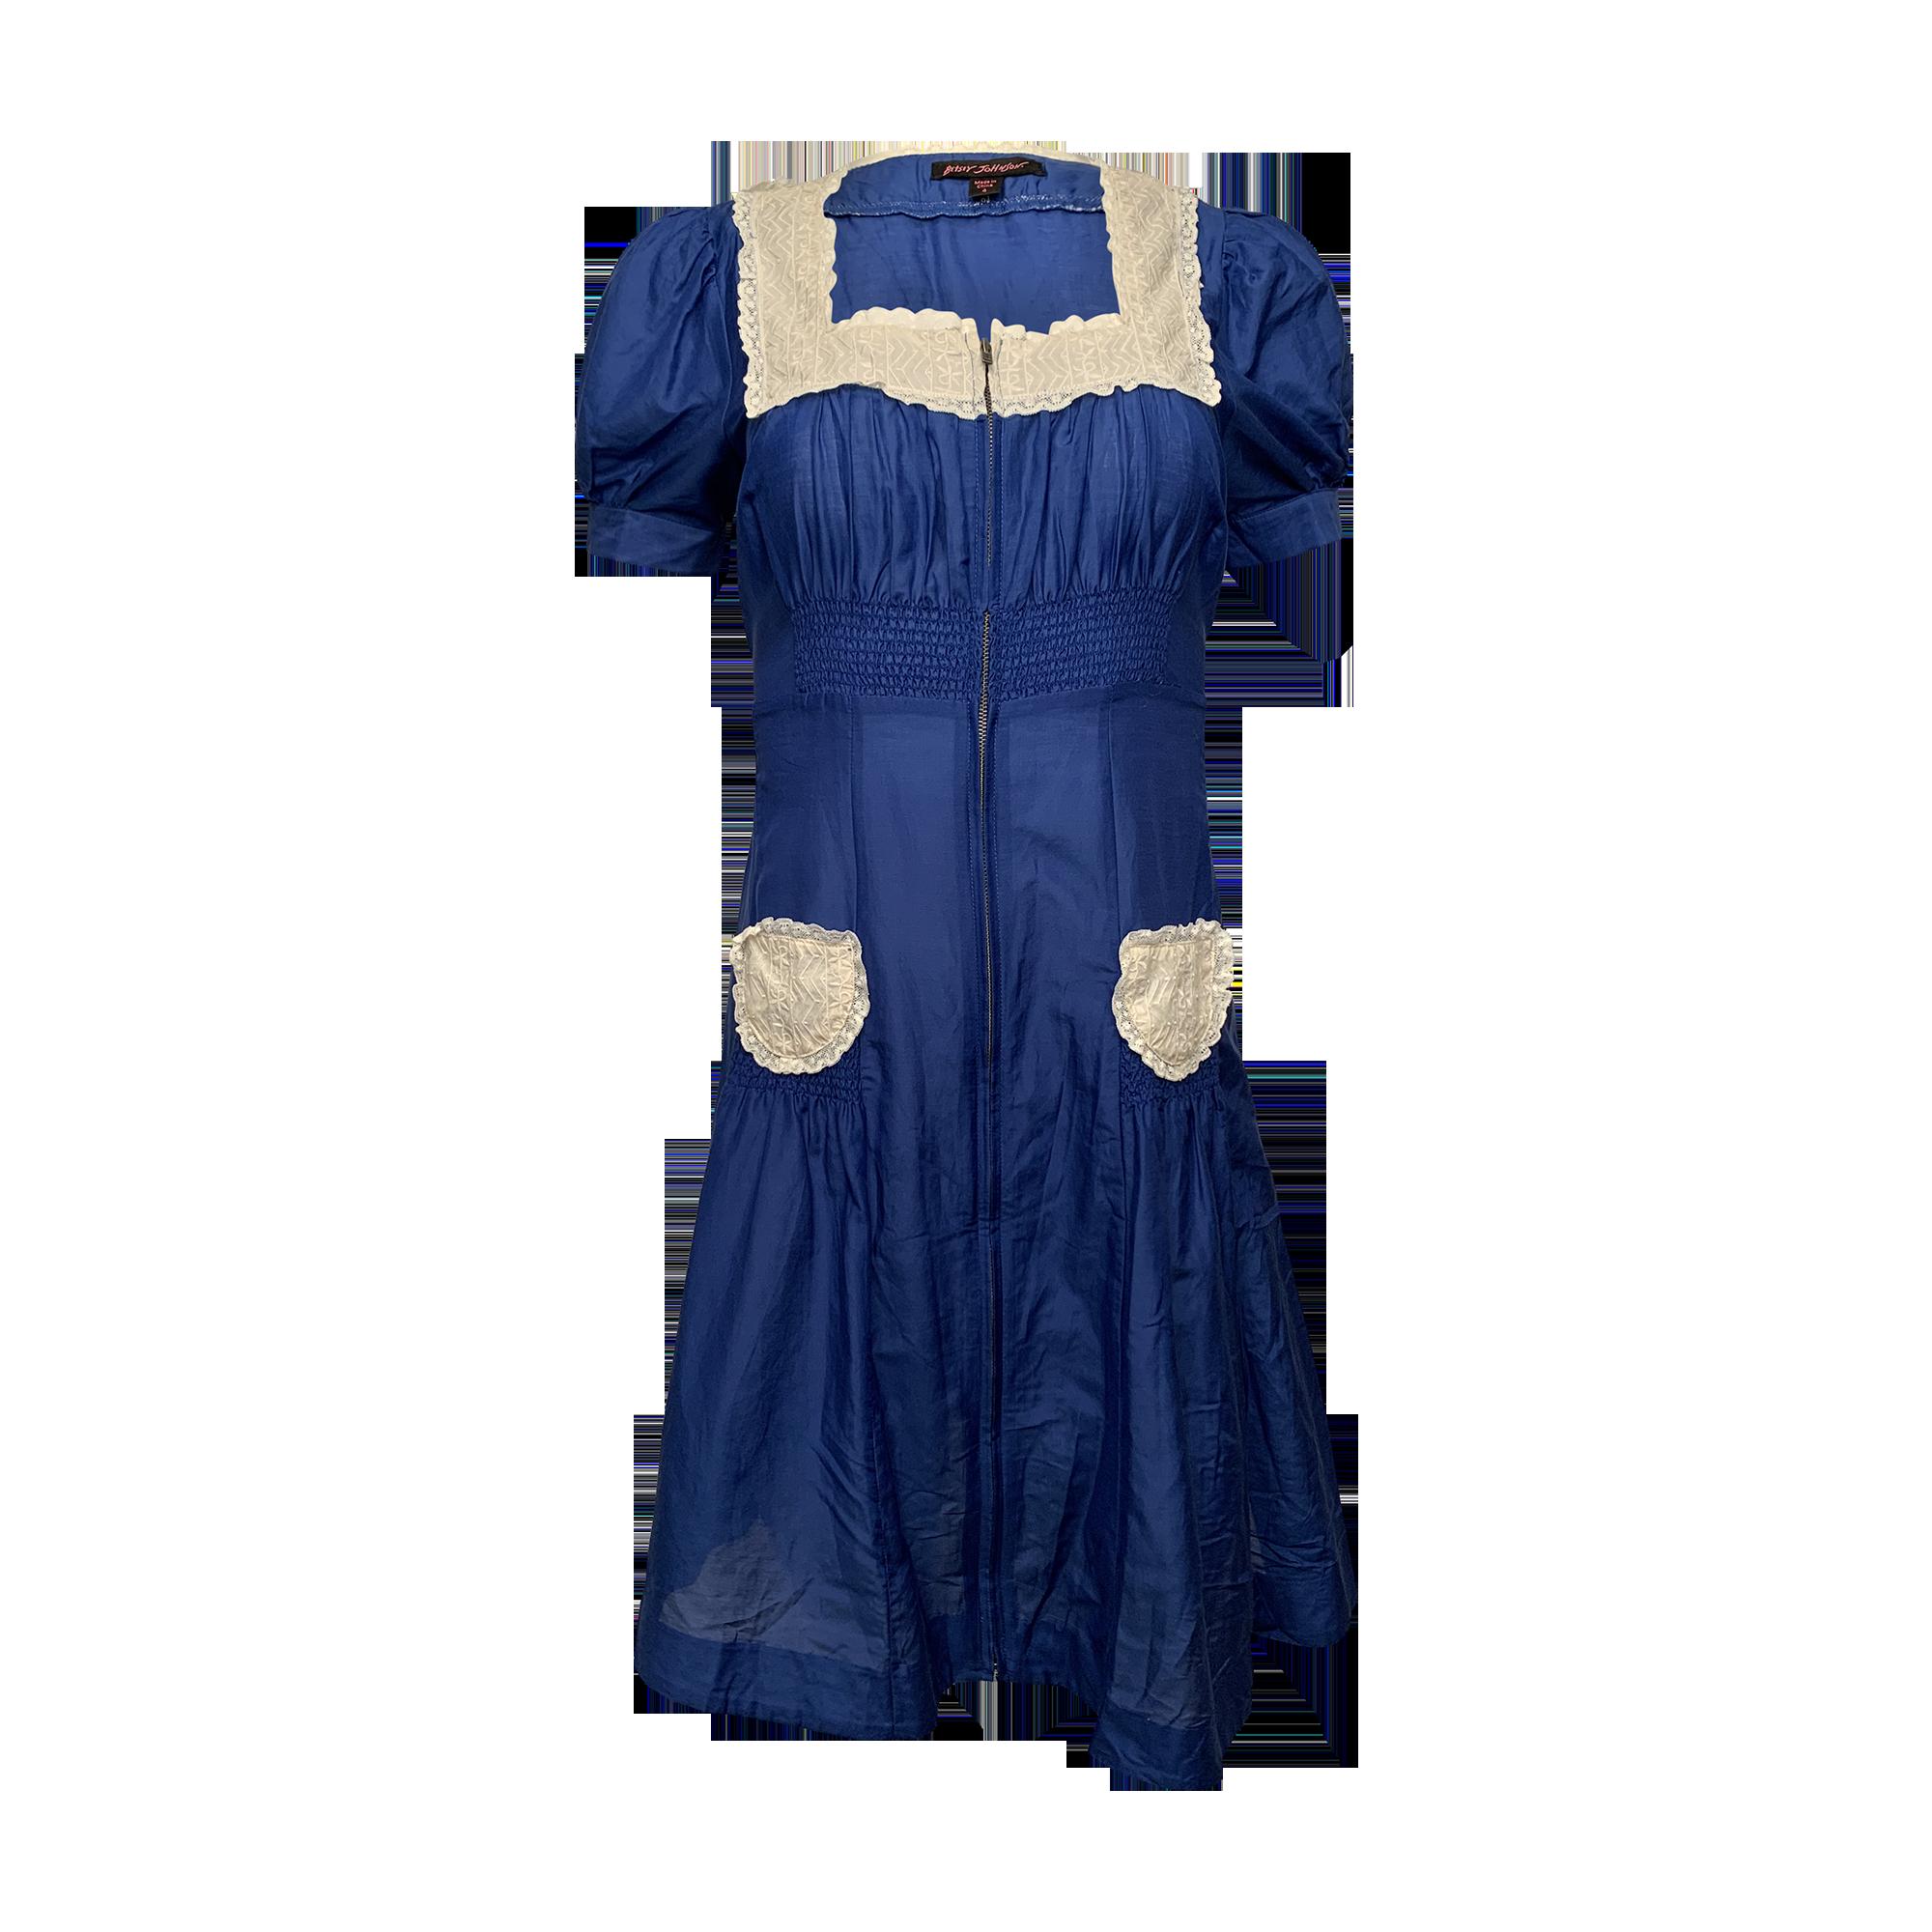 Blue Baby Doll Dress Blue Babydoll Dress Dresses Babydoll Dress [ 2000 x 2000 Pixel ]